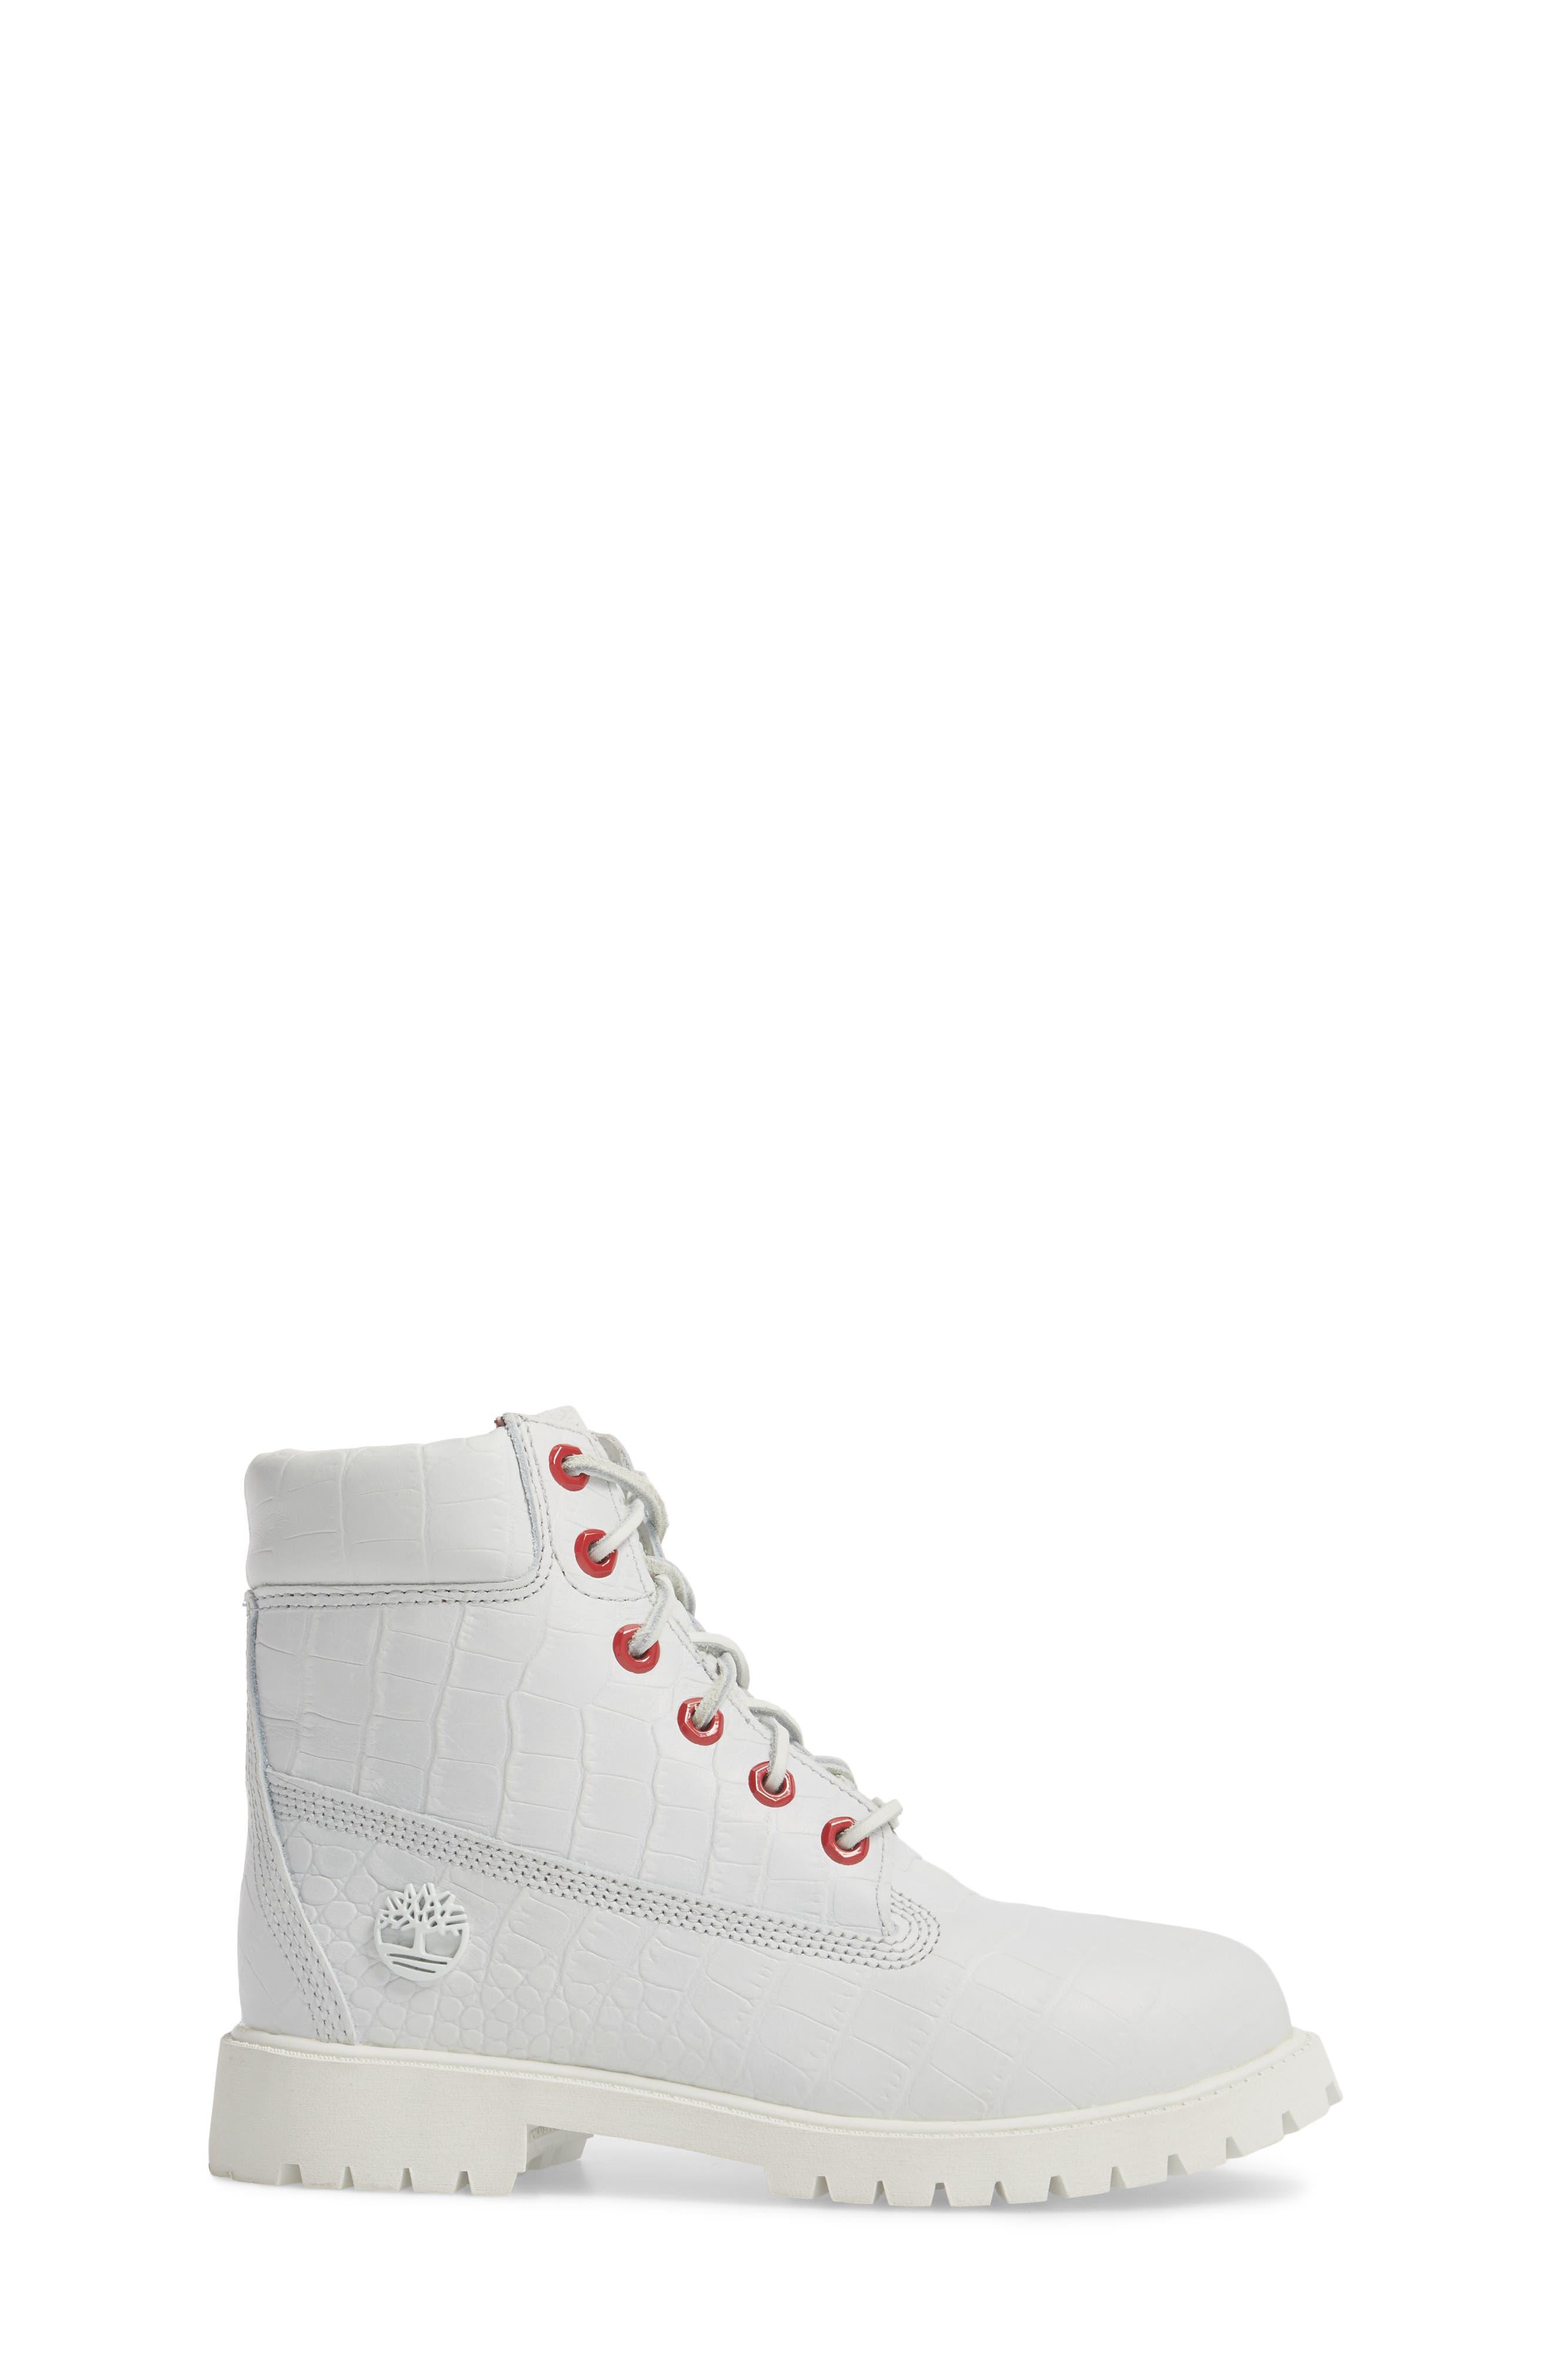 6-Inch Premium Waterproof Boot,                             Alternate thumbnail 3, color,                             White Cardinal Exotic